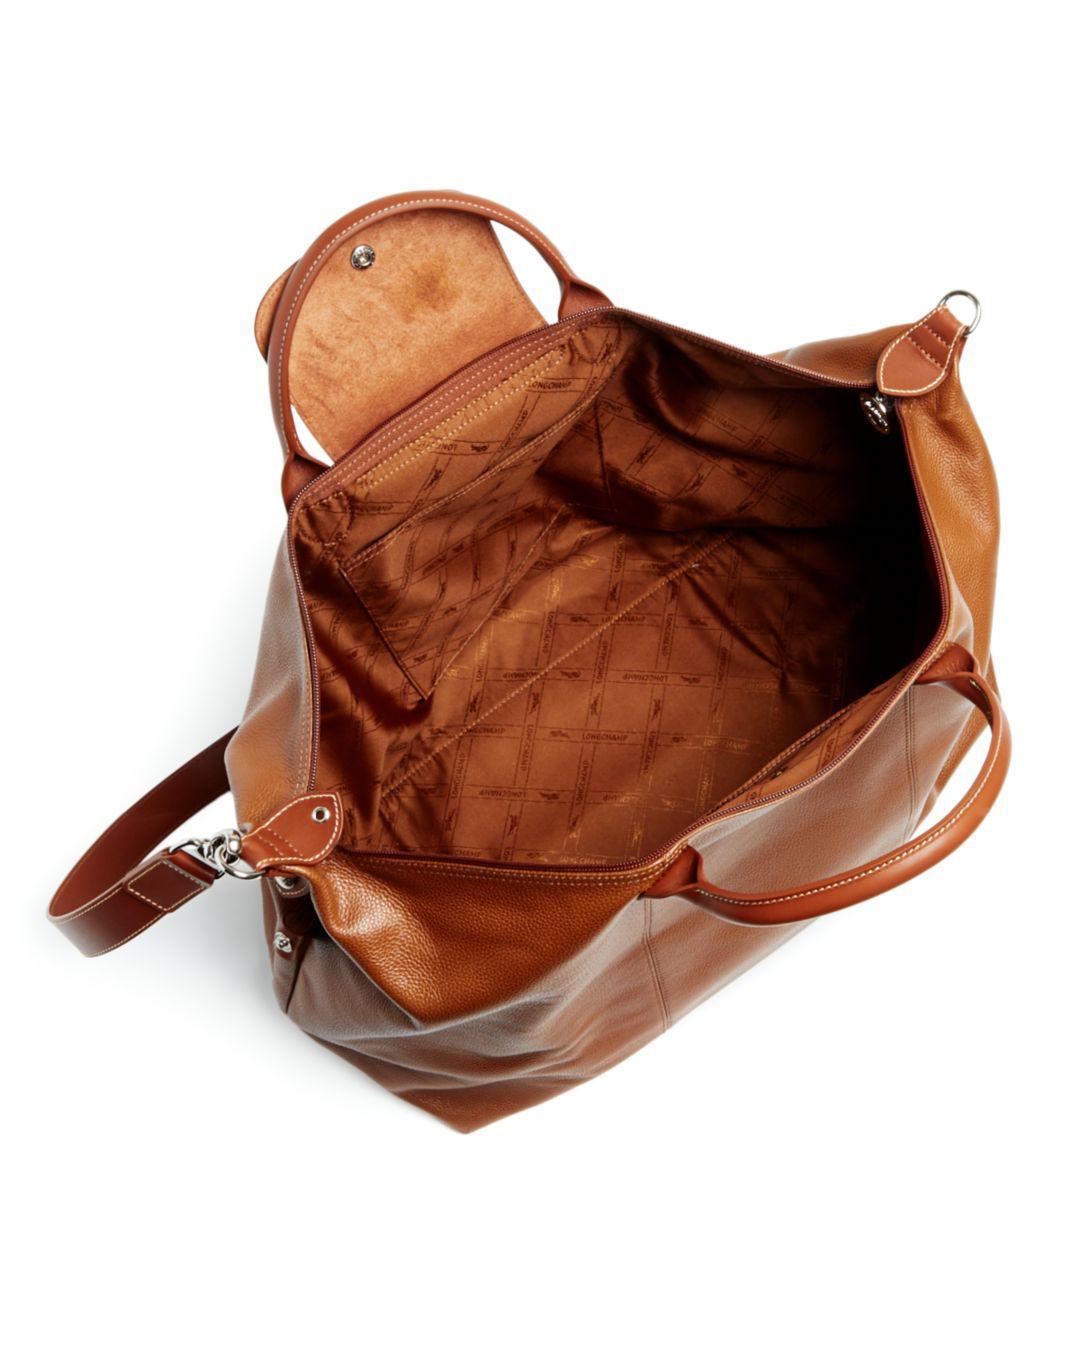 177d8a84f3a8 Lyst - Longchamp Le Foulonné Leather Duffel Bag in Brown for Men